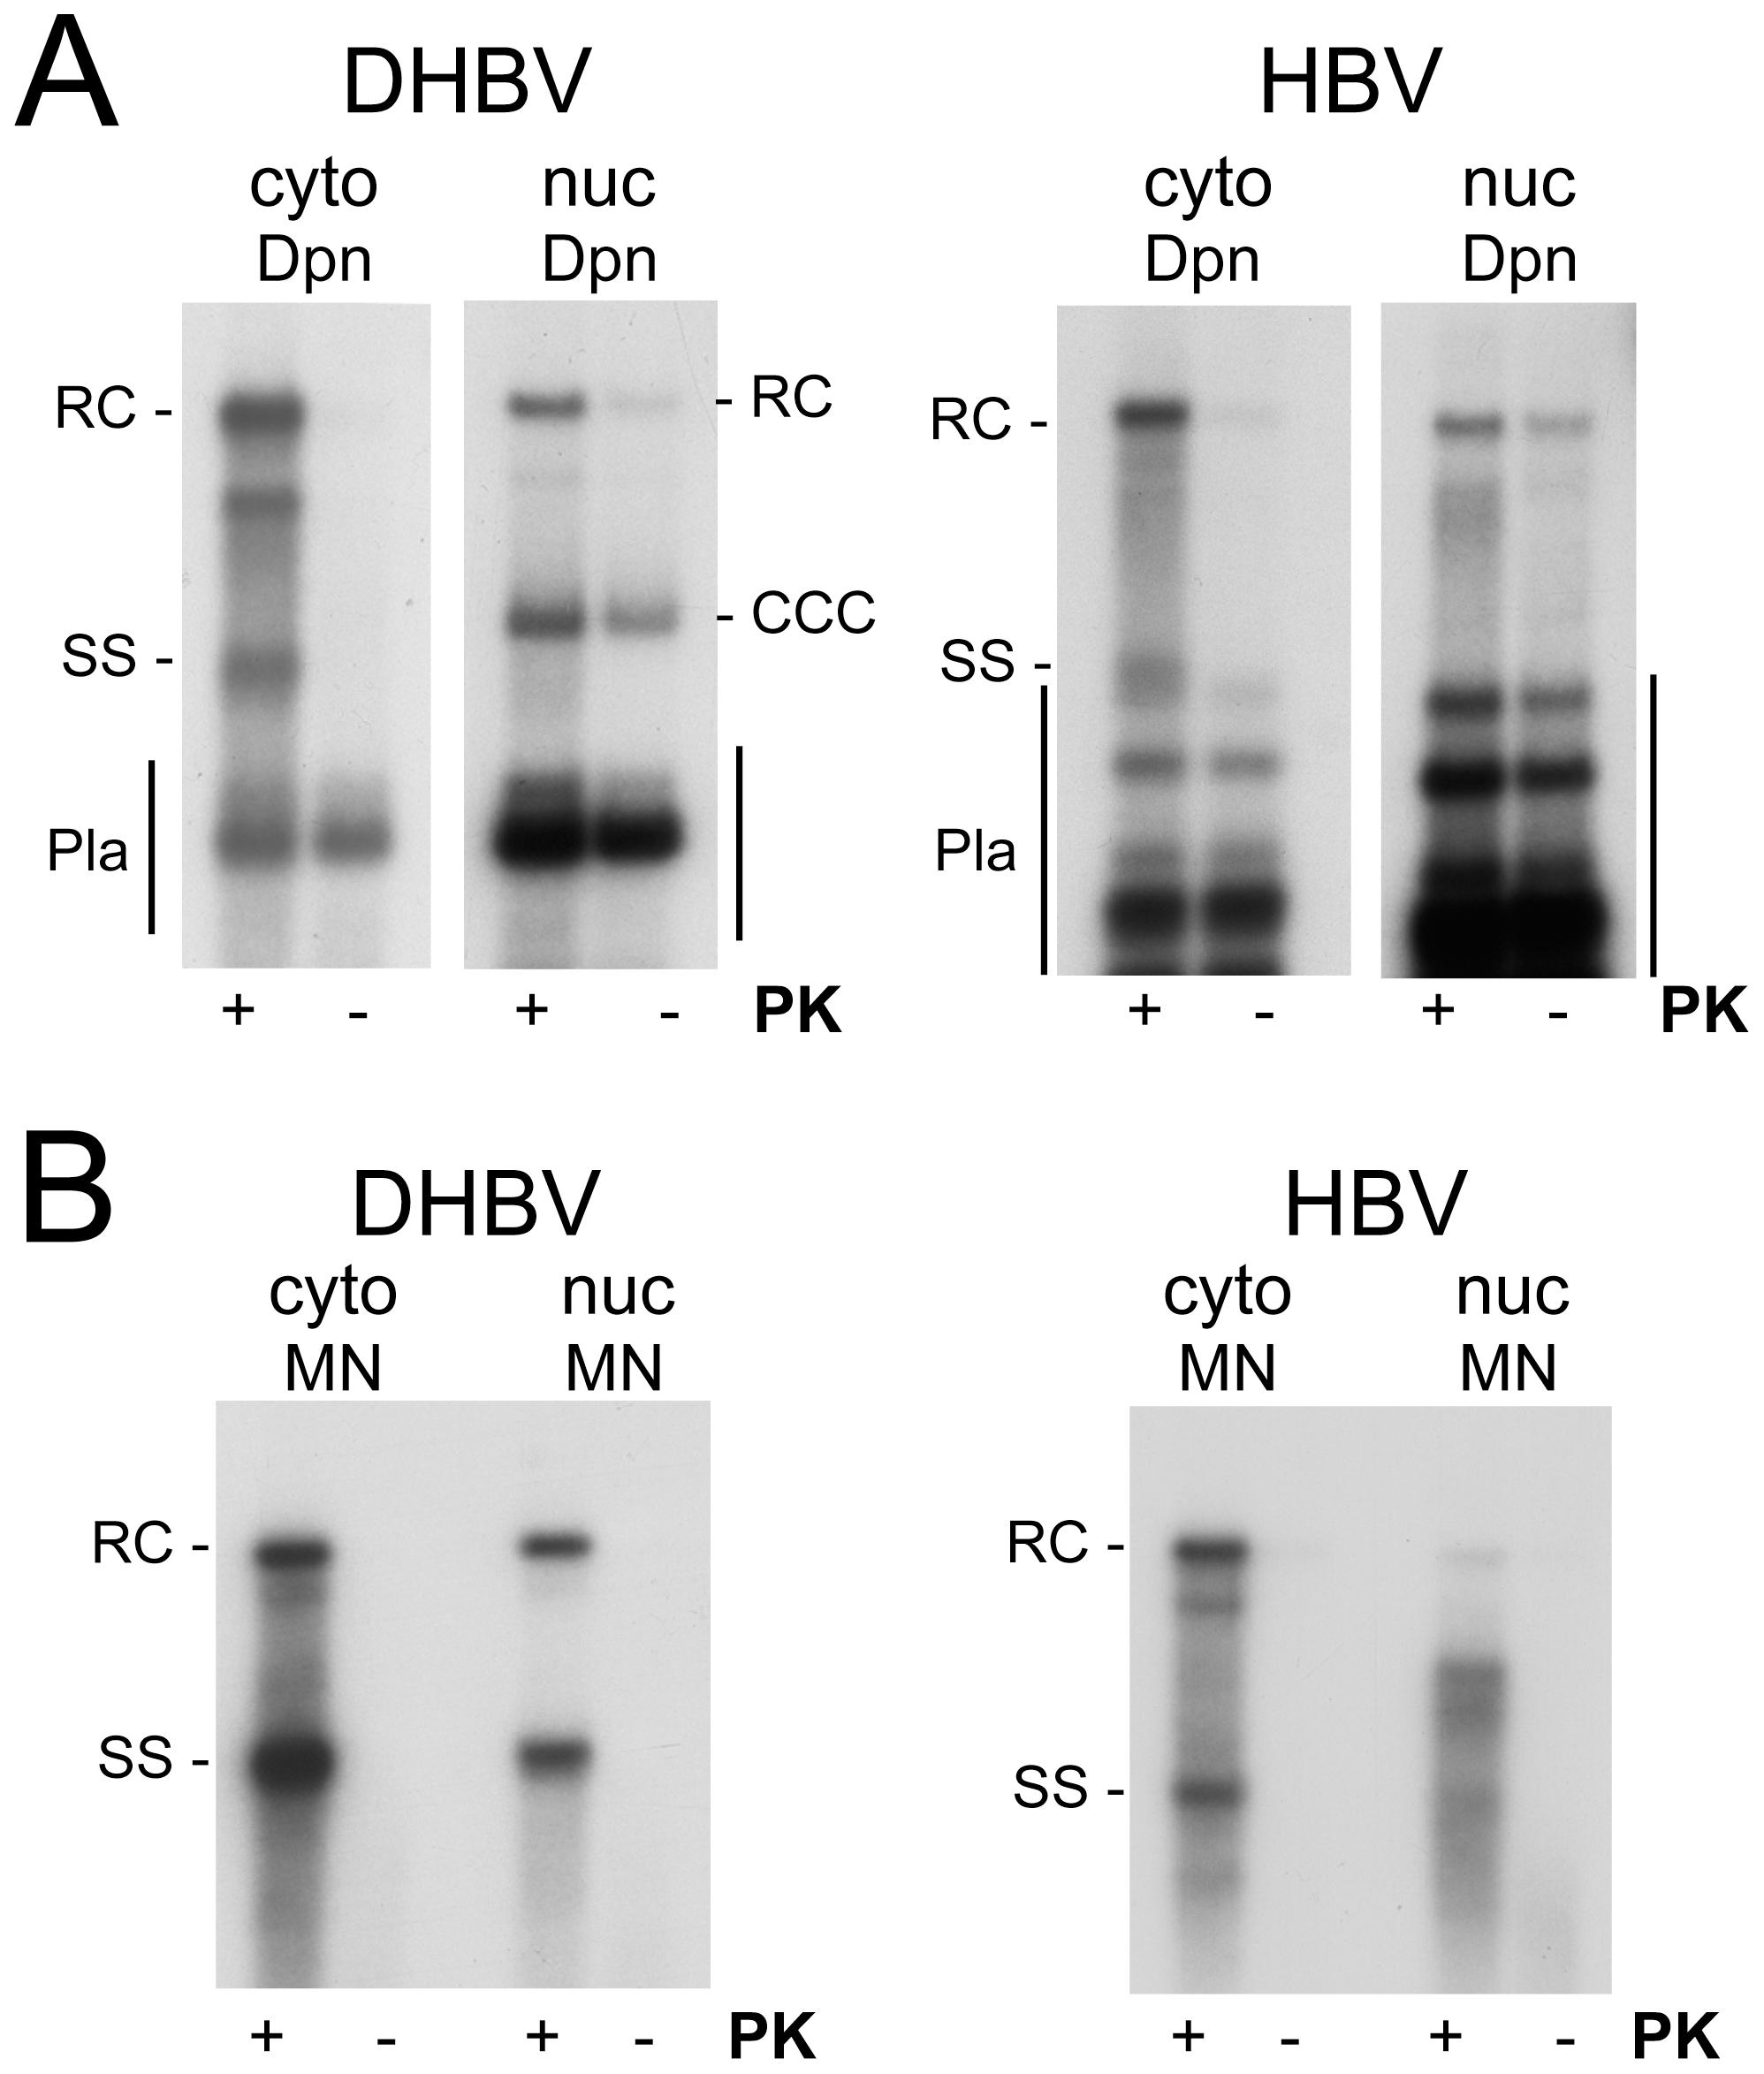 Polymerase linkage status of cytoplasmic versus nuclear viral DNAs.